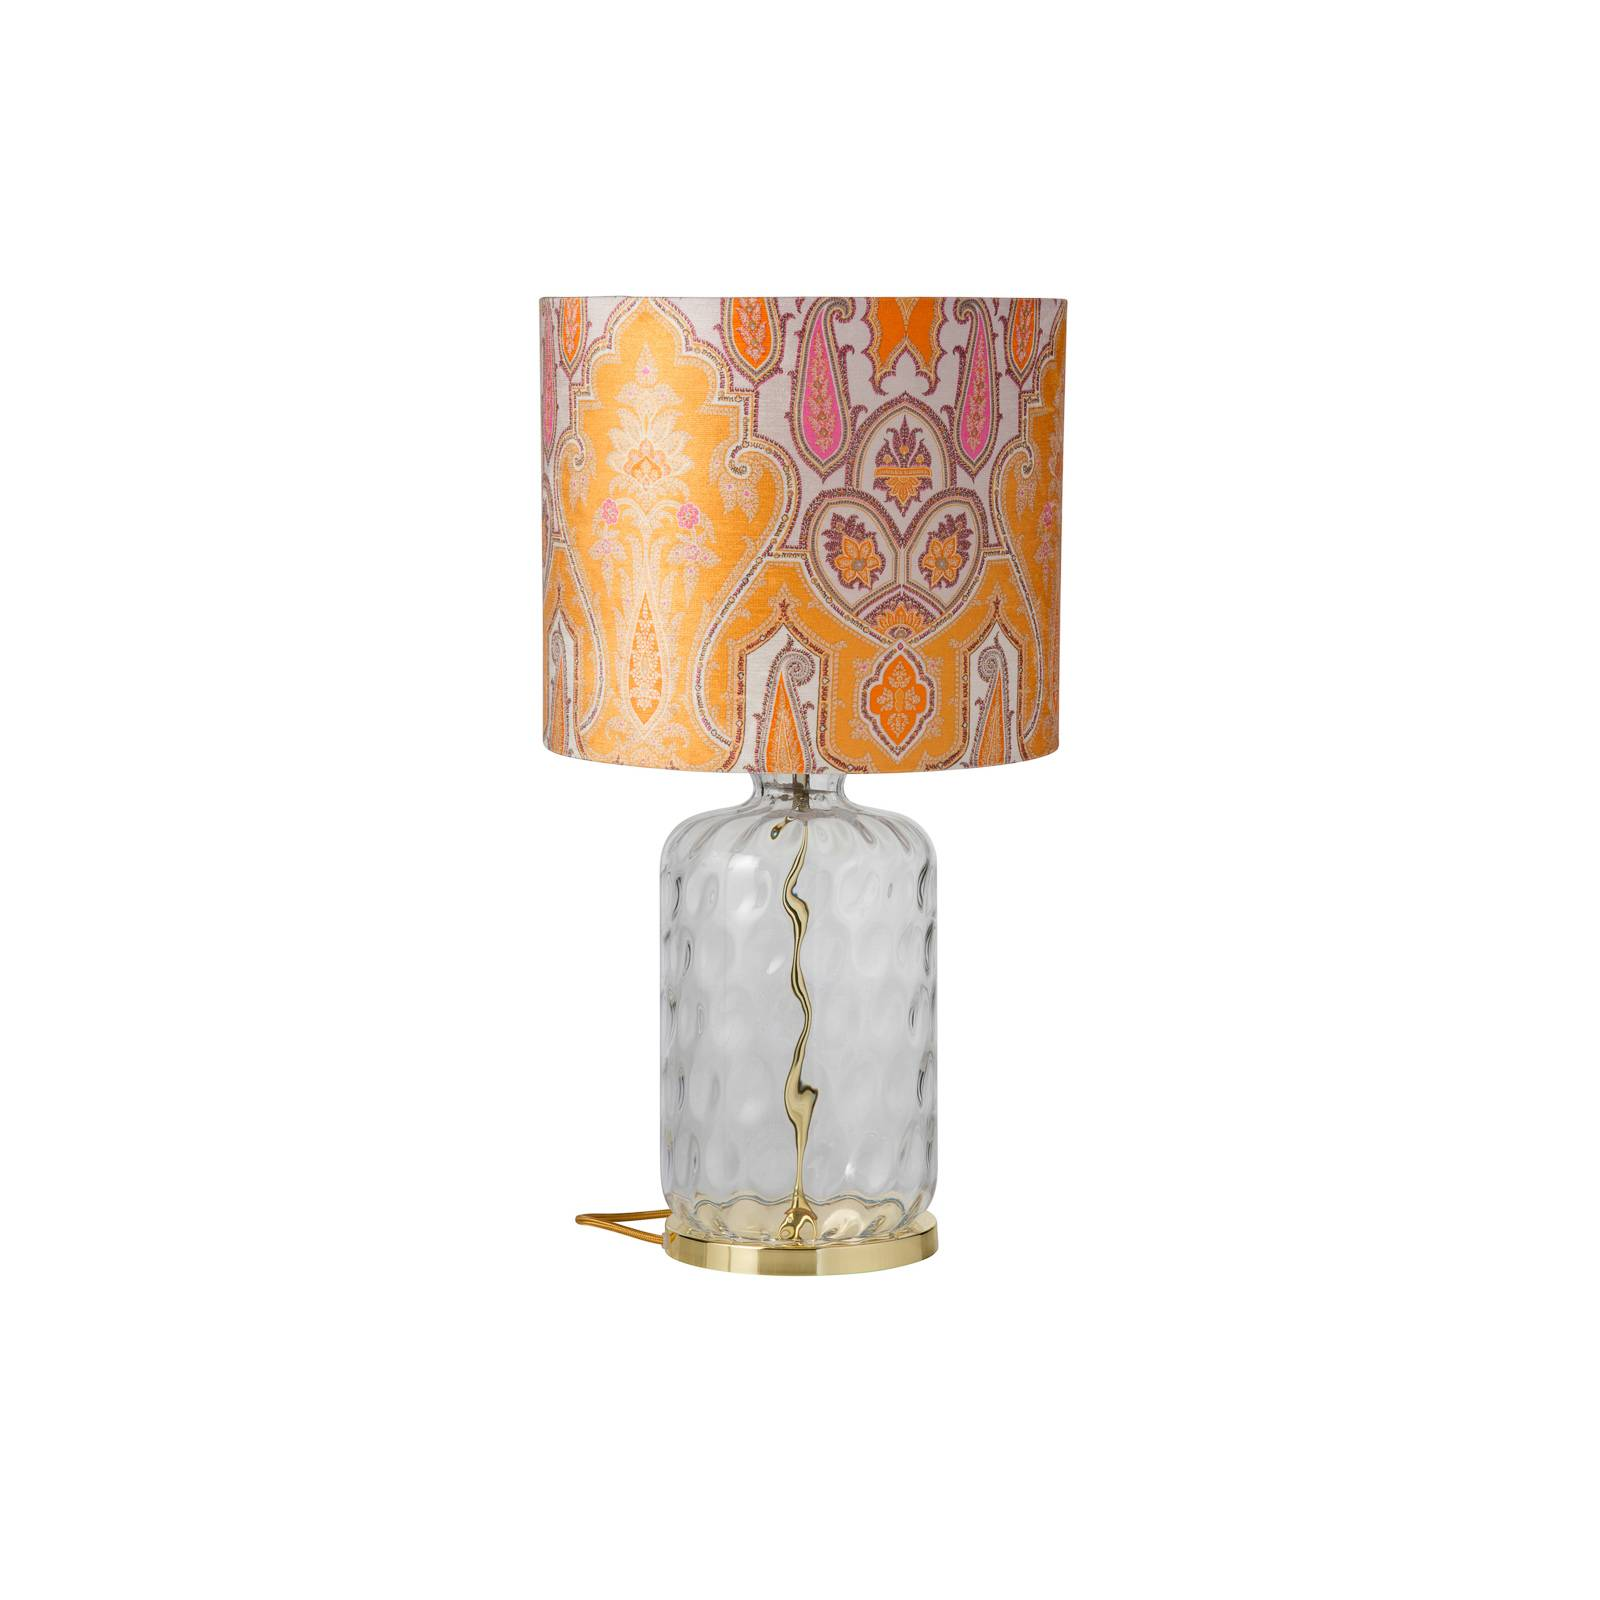 EBB & FLOW Pillar lampe à poser, yellow/pink